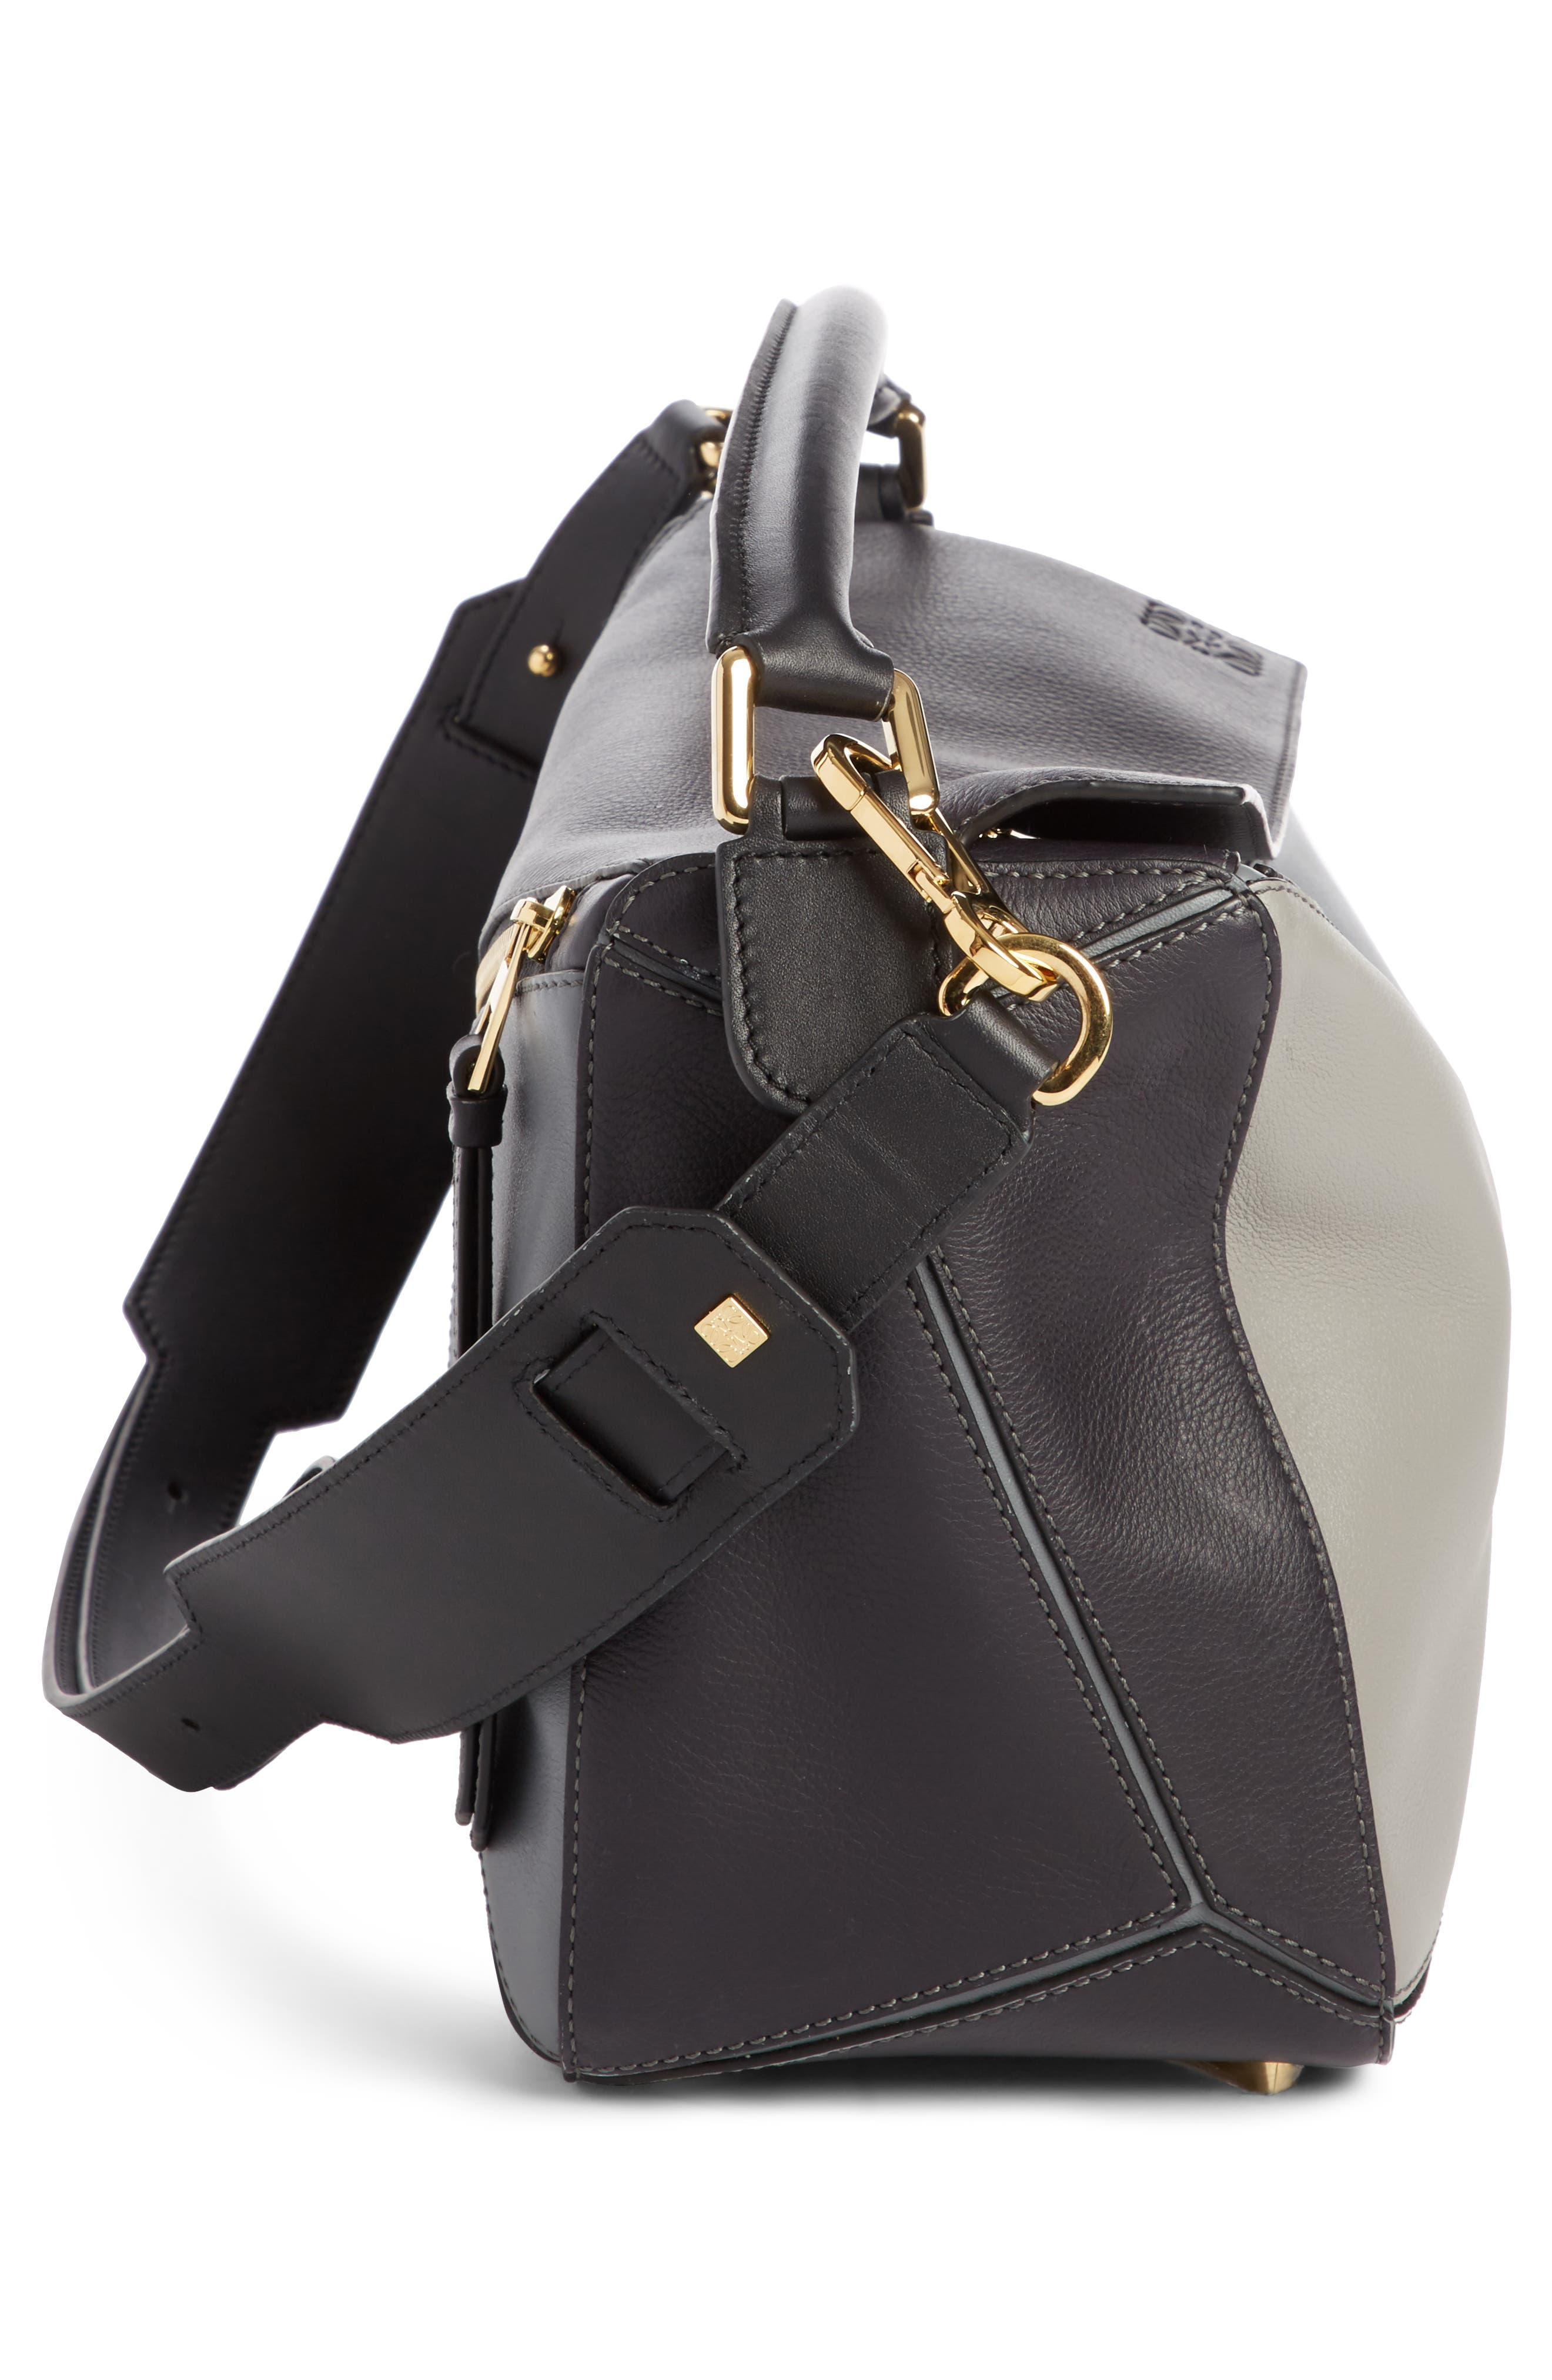 Medium Puzzle Colorblock Leather Shoulder Bag,                             Alternate thumbnail 3, color,                             Grey Multi Tone